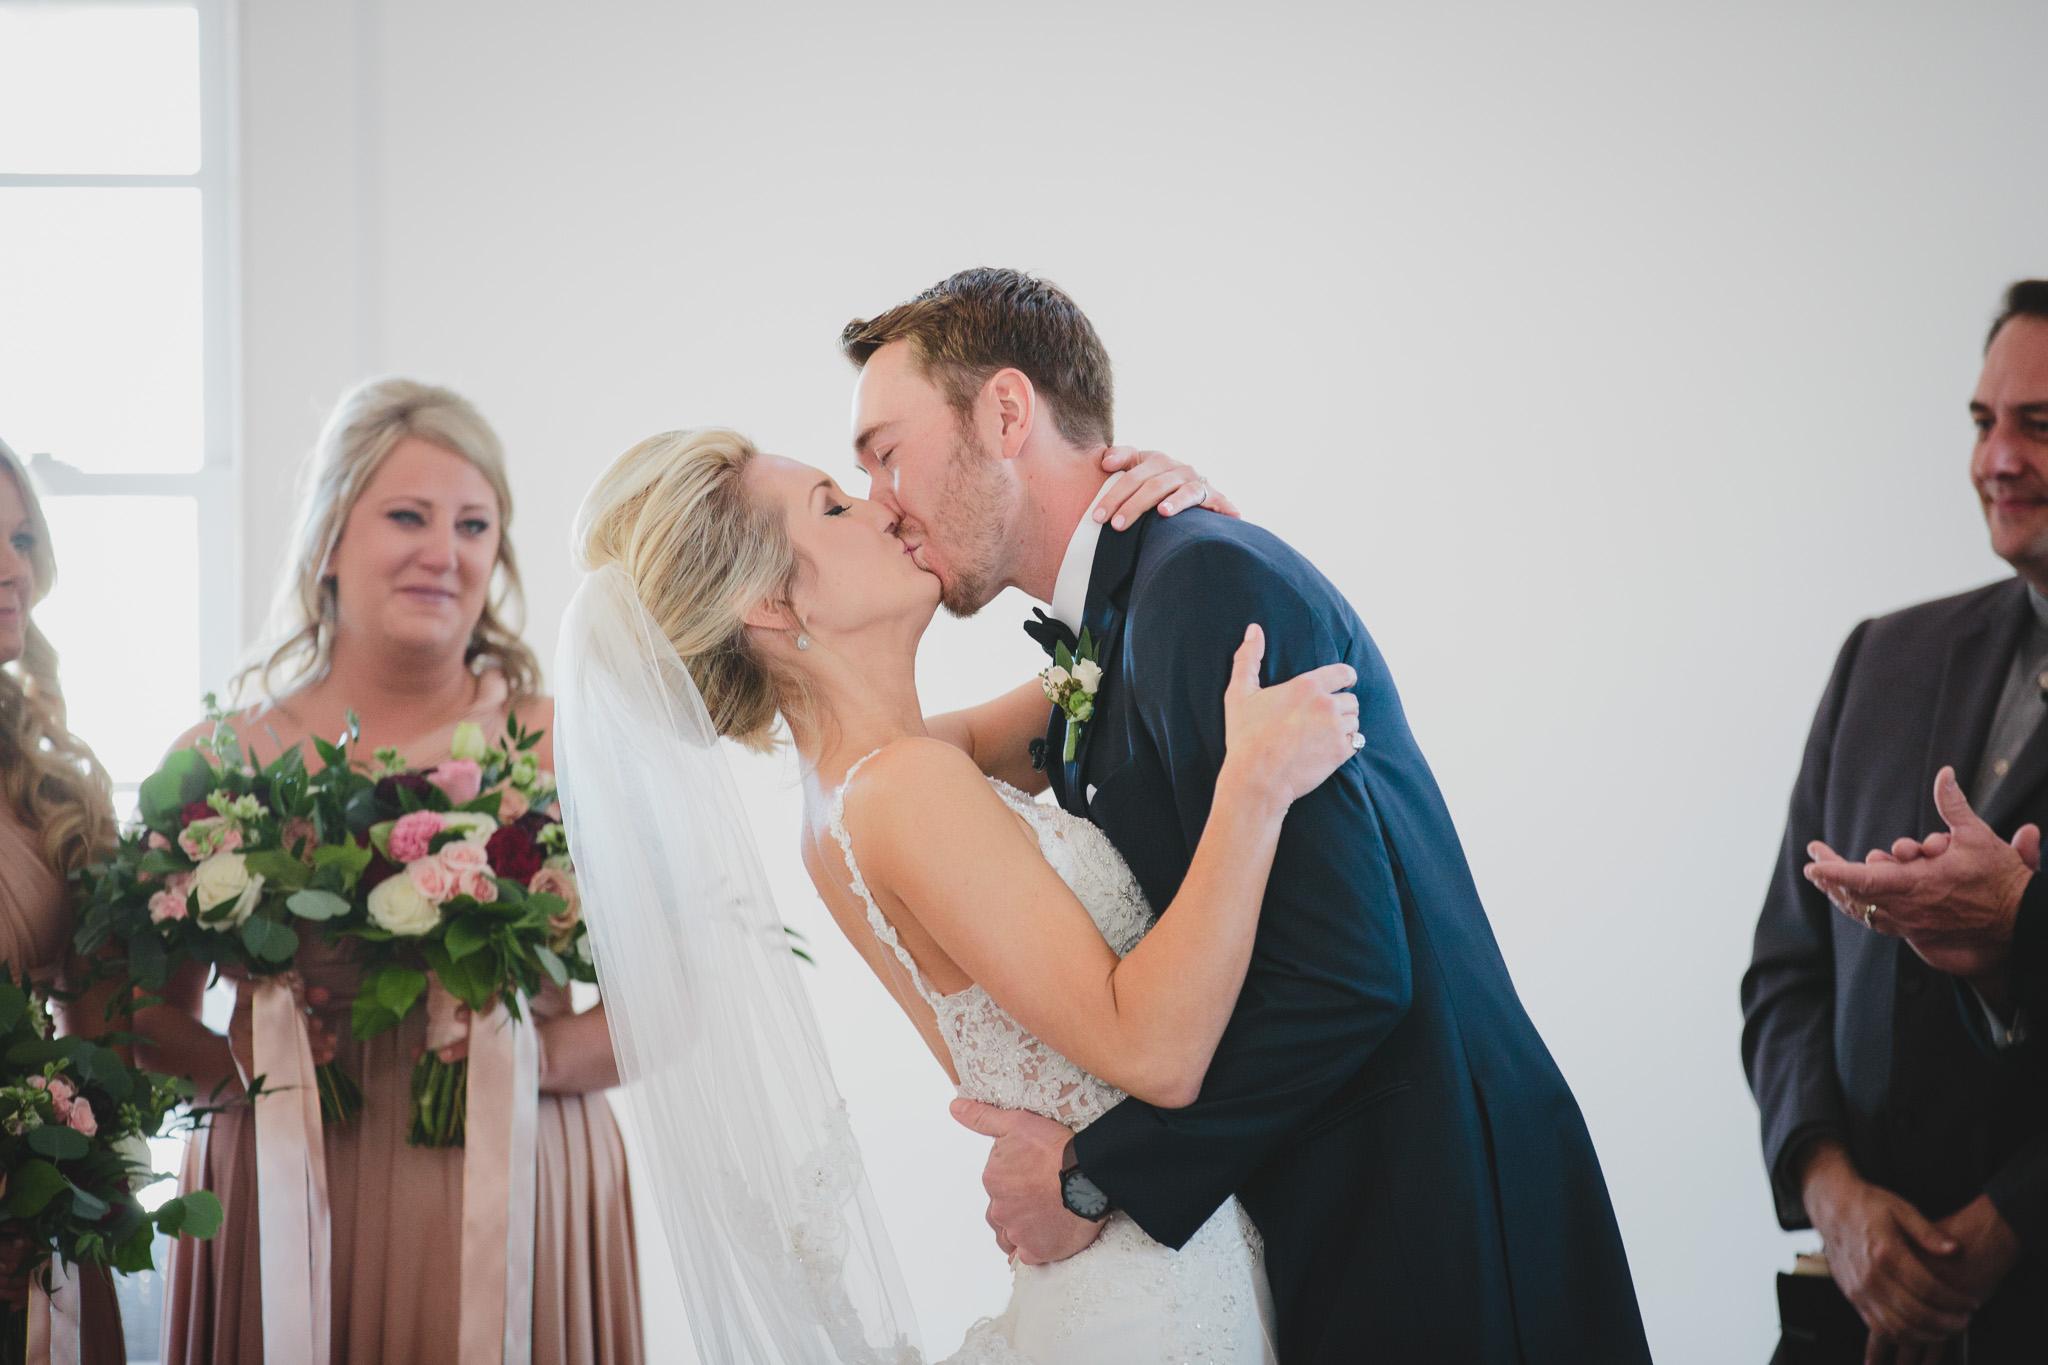 white-room-wedding-venue-ceremony-st-augustine-florida